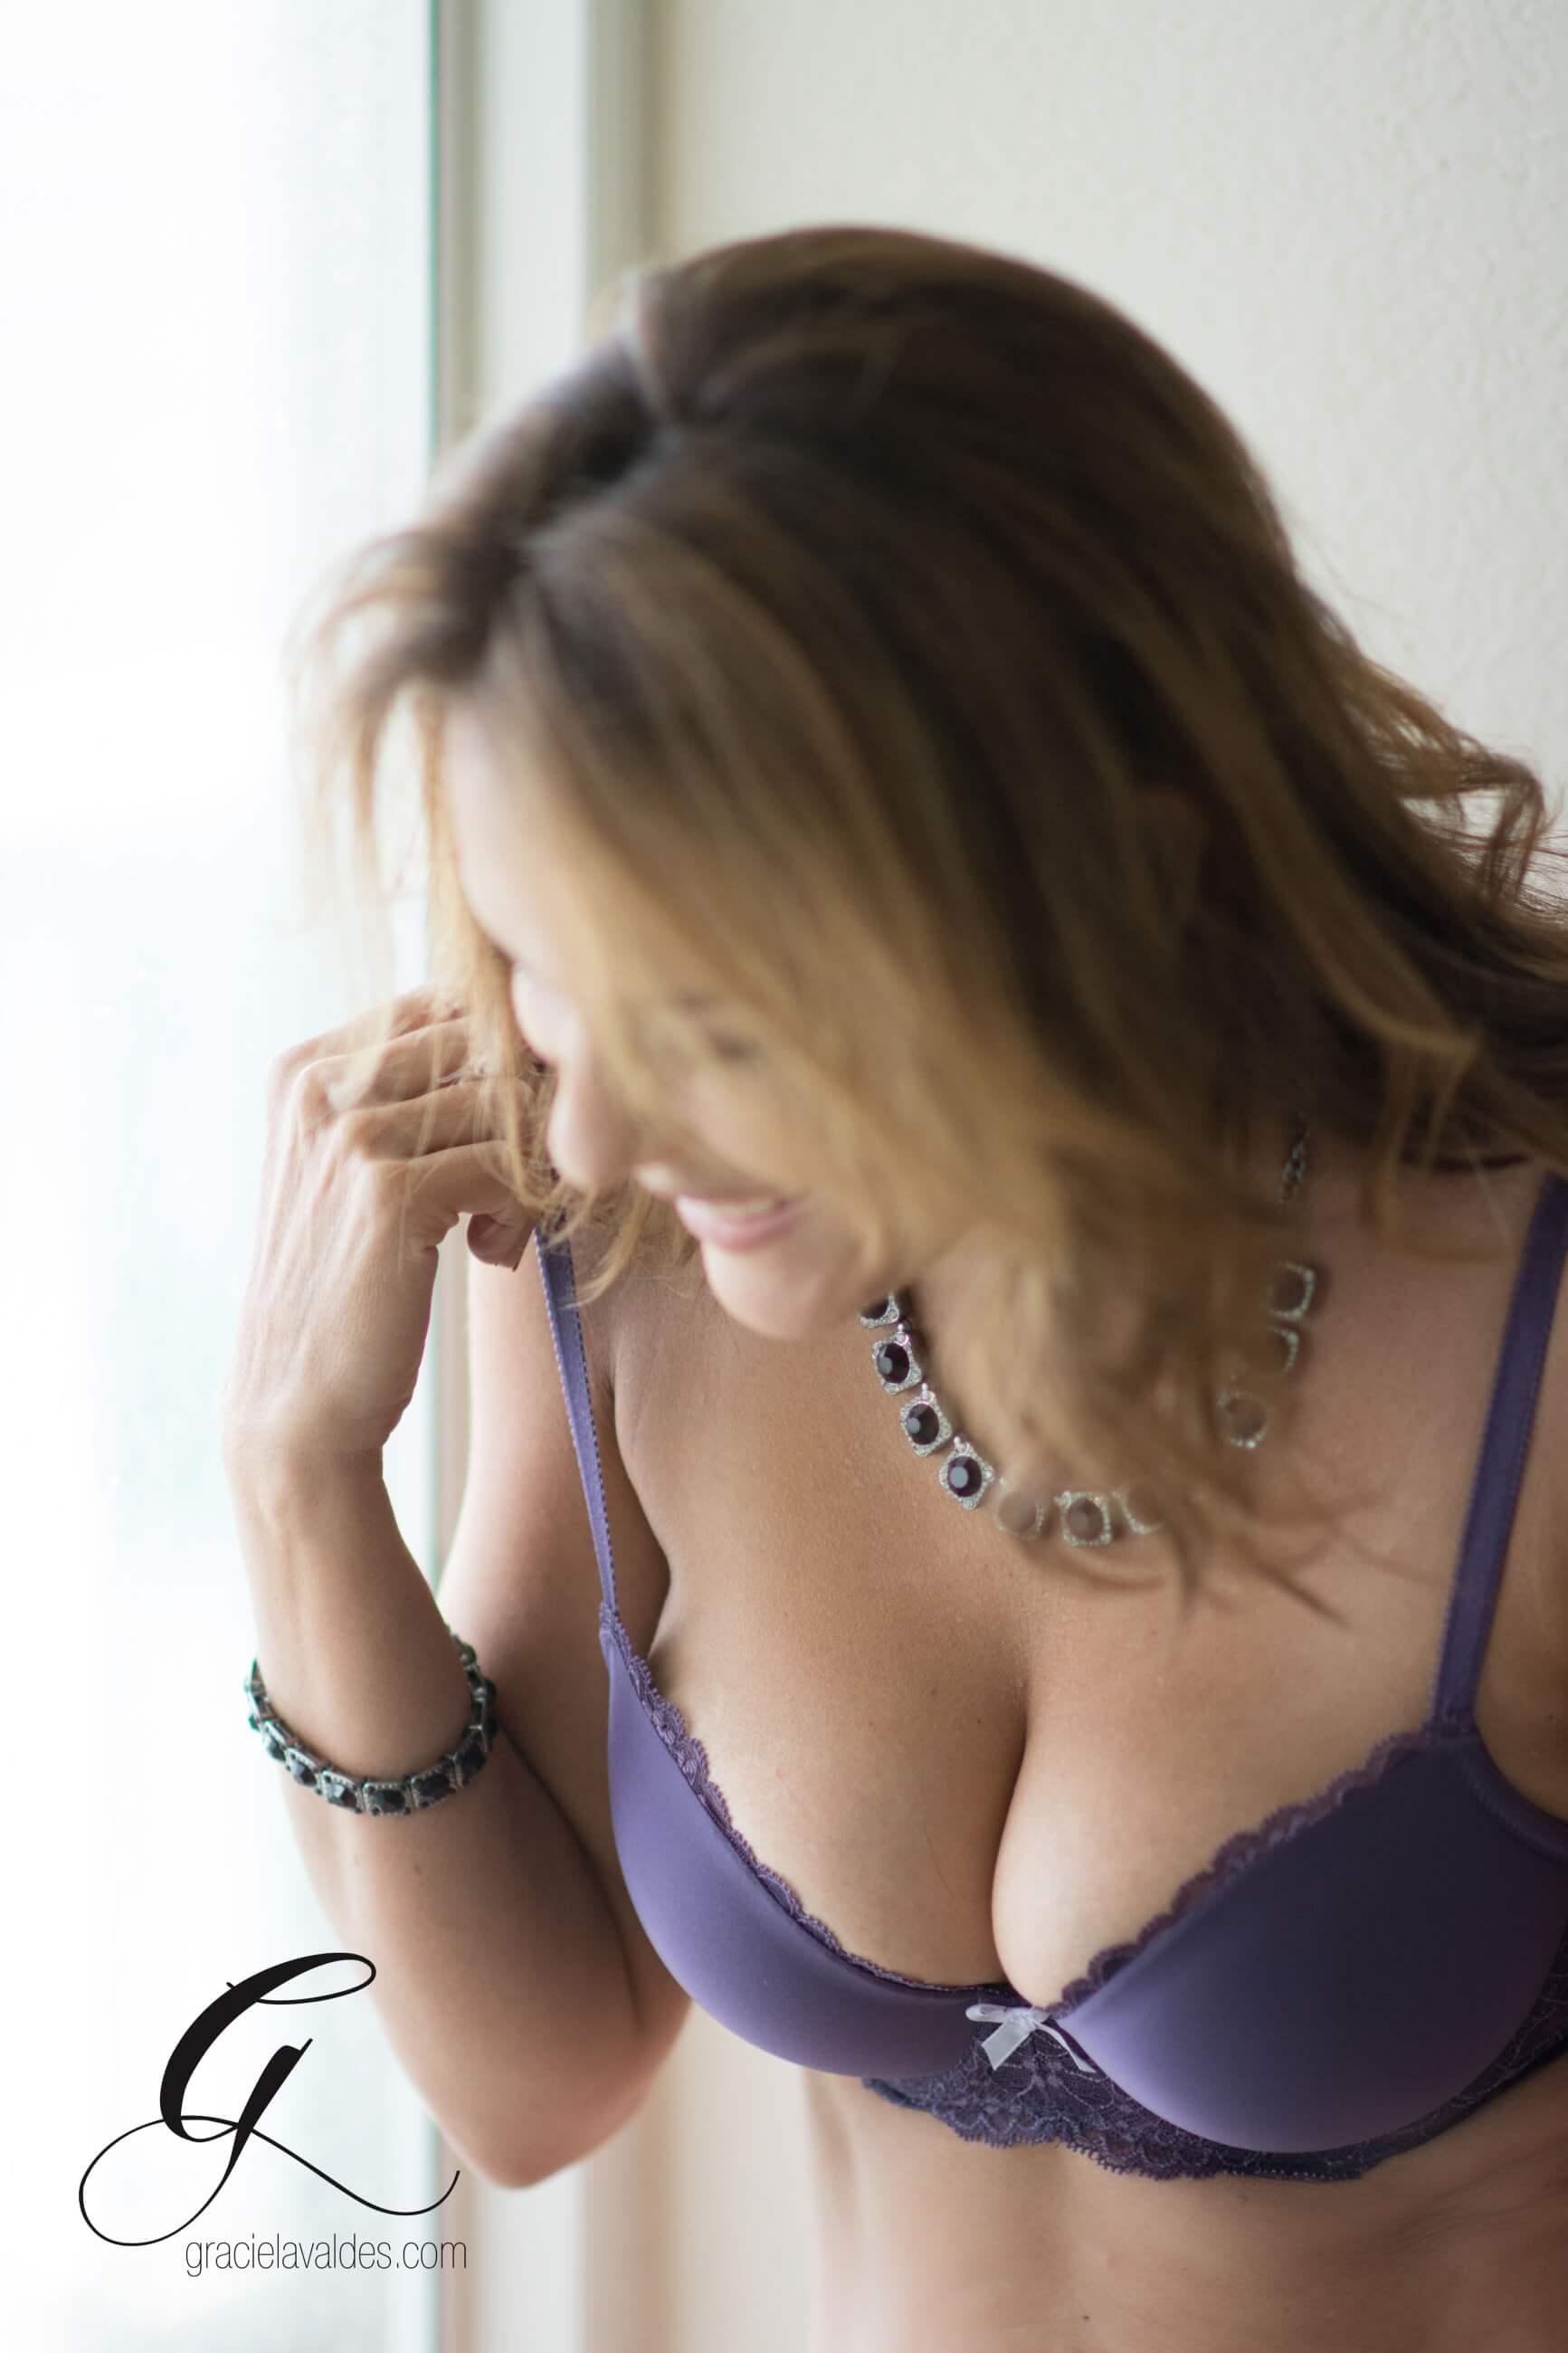 Celebrate LIfe boudoir Graciela Valdes7.jpg